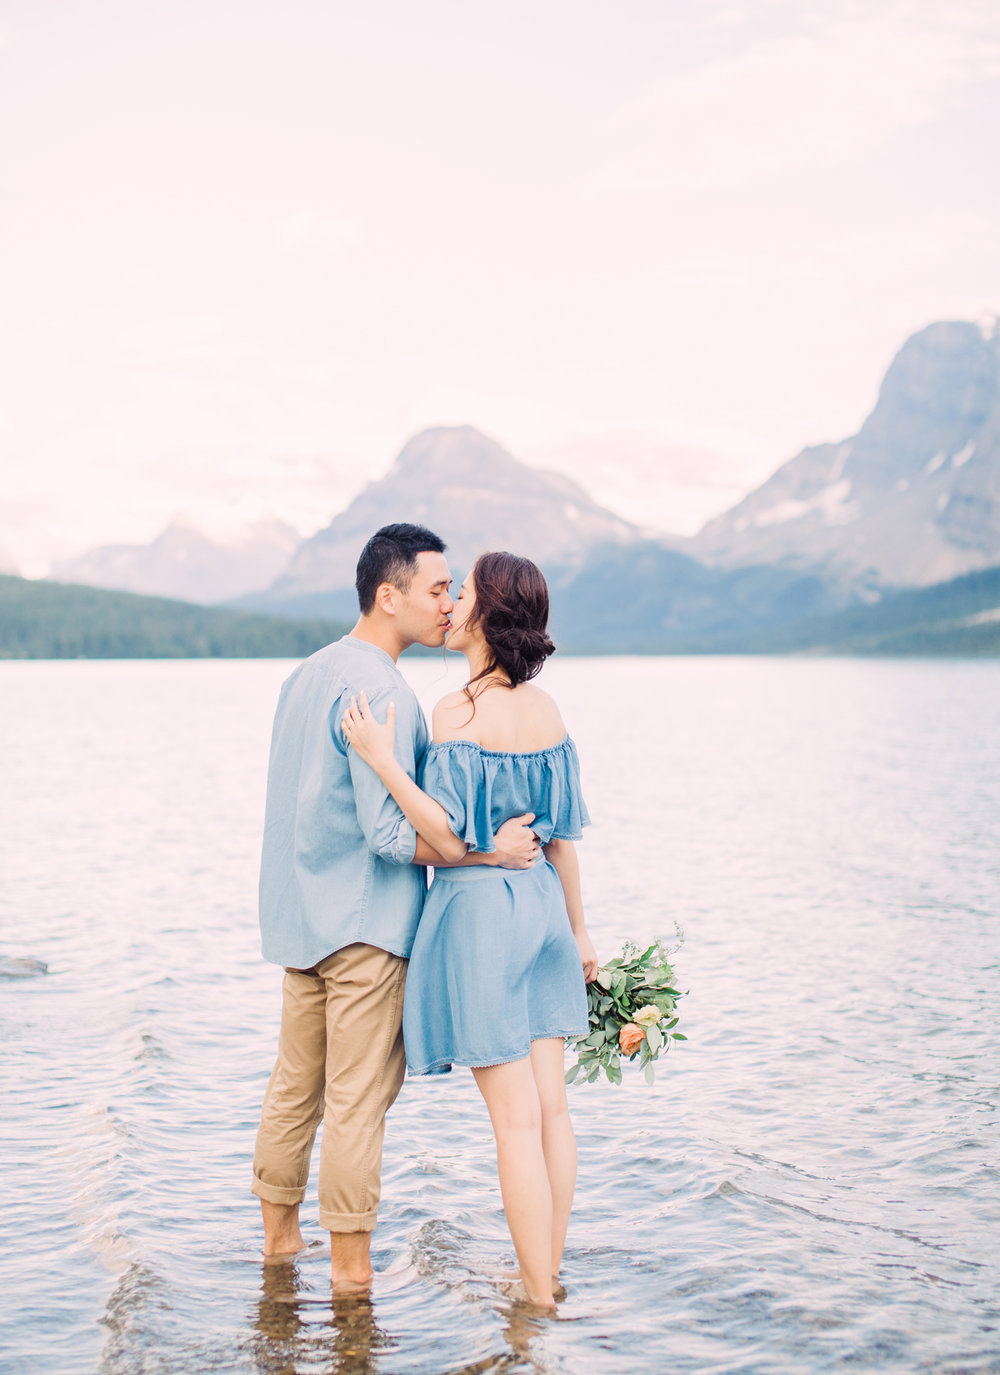 Helen + Gary - Banff, Alberta